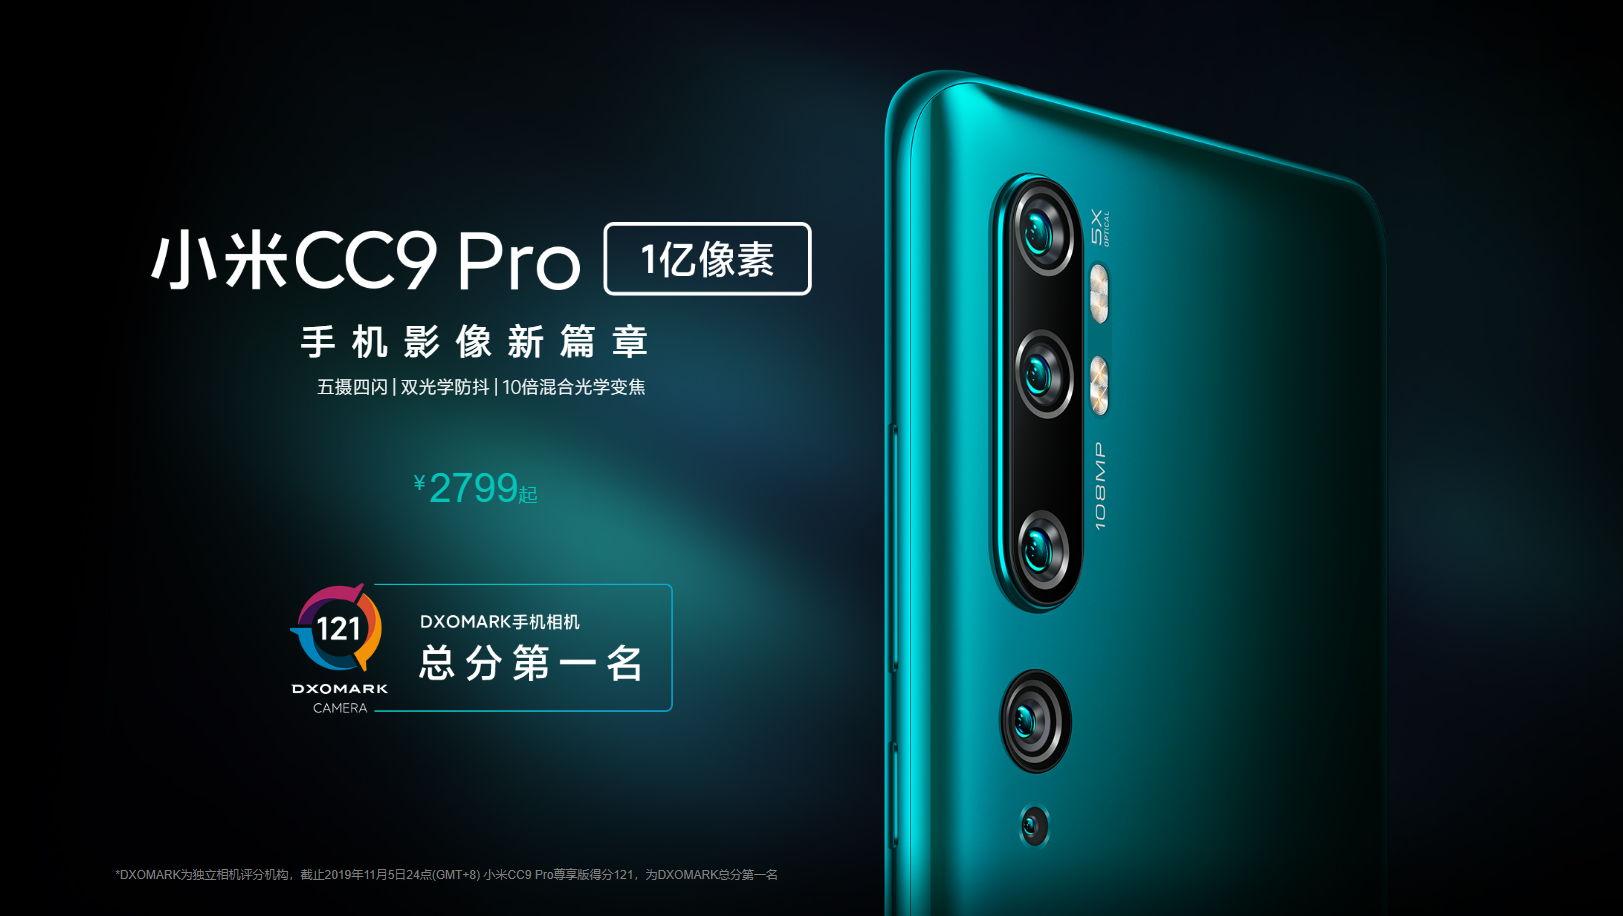 DxOMark公布小米CC9 Pro尊享版拍照评分:121与华为Mate30 Pro并列第一